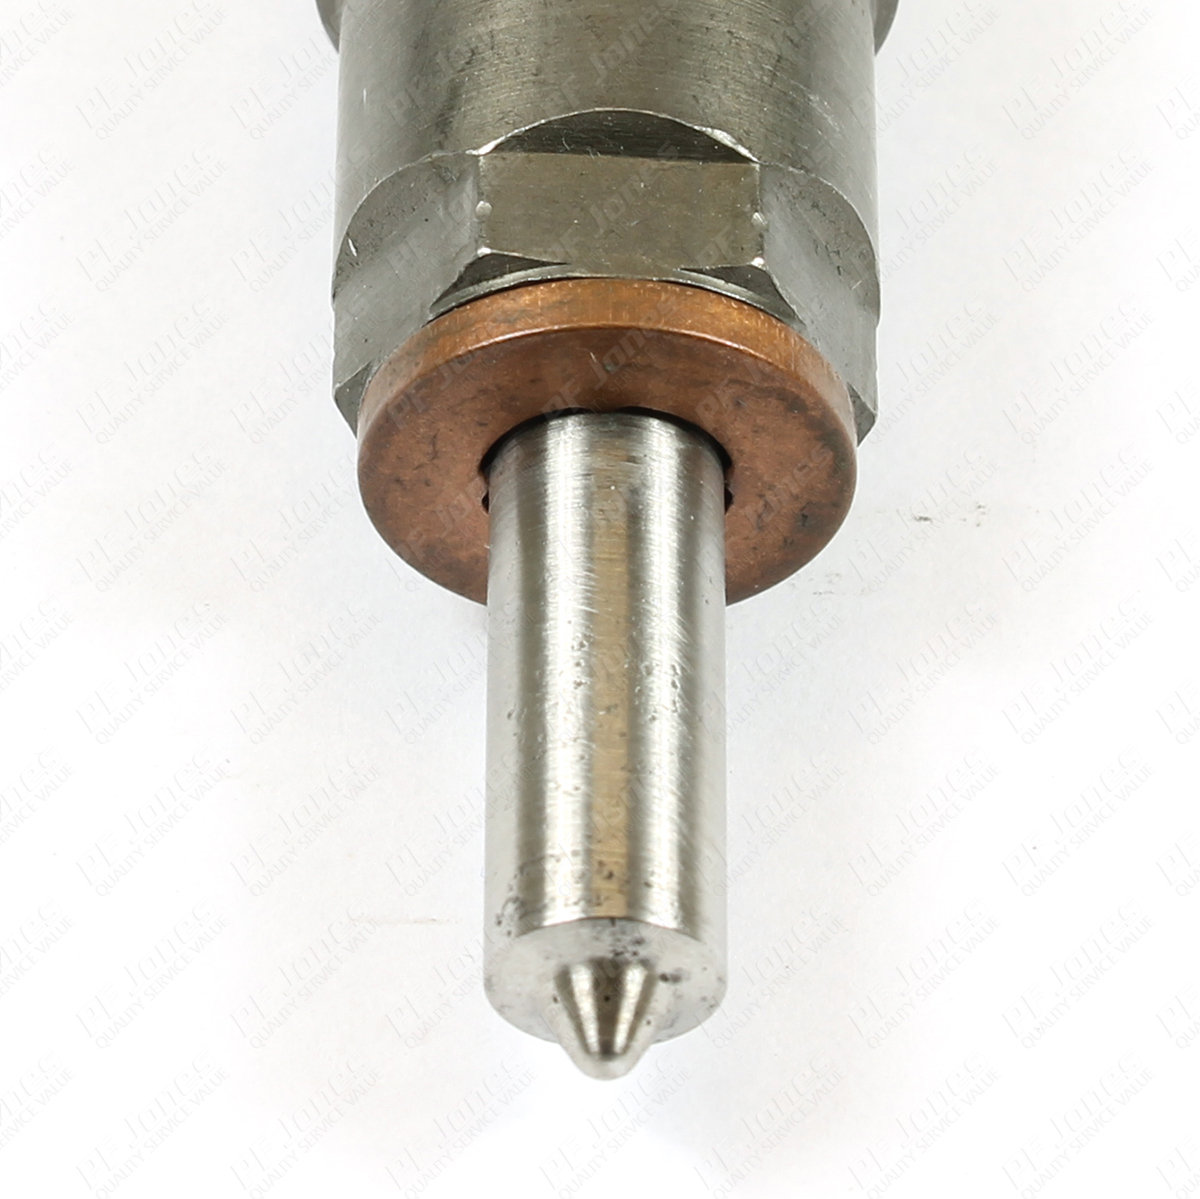 Fiat Marea 1.9 JTD 2000-2002 New Bosch Diesel Injector 0445110119